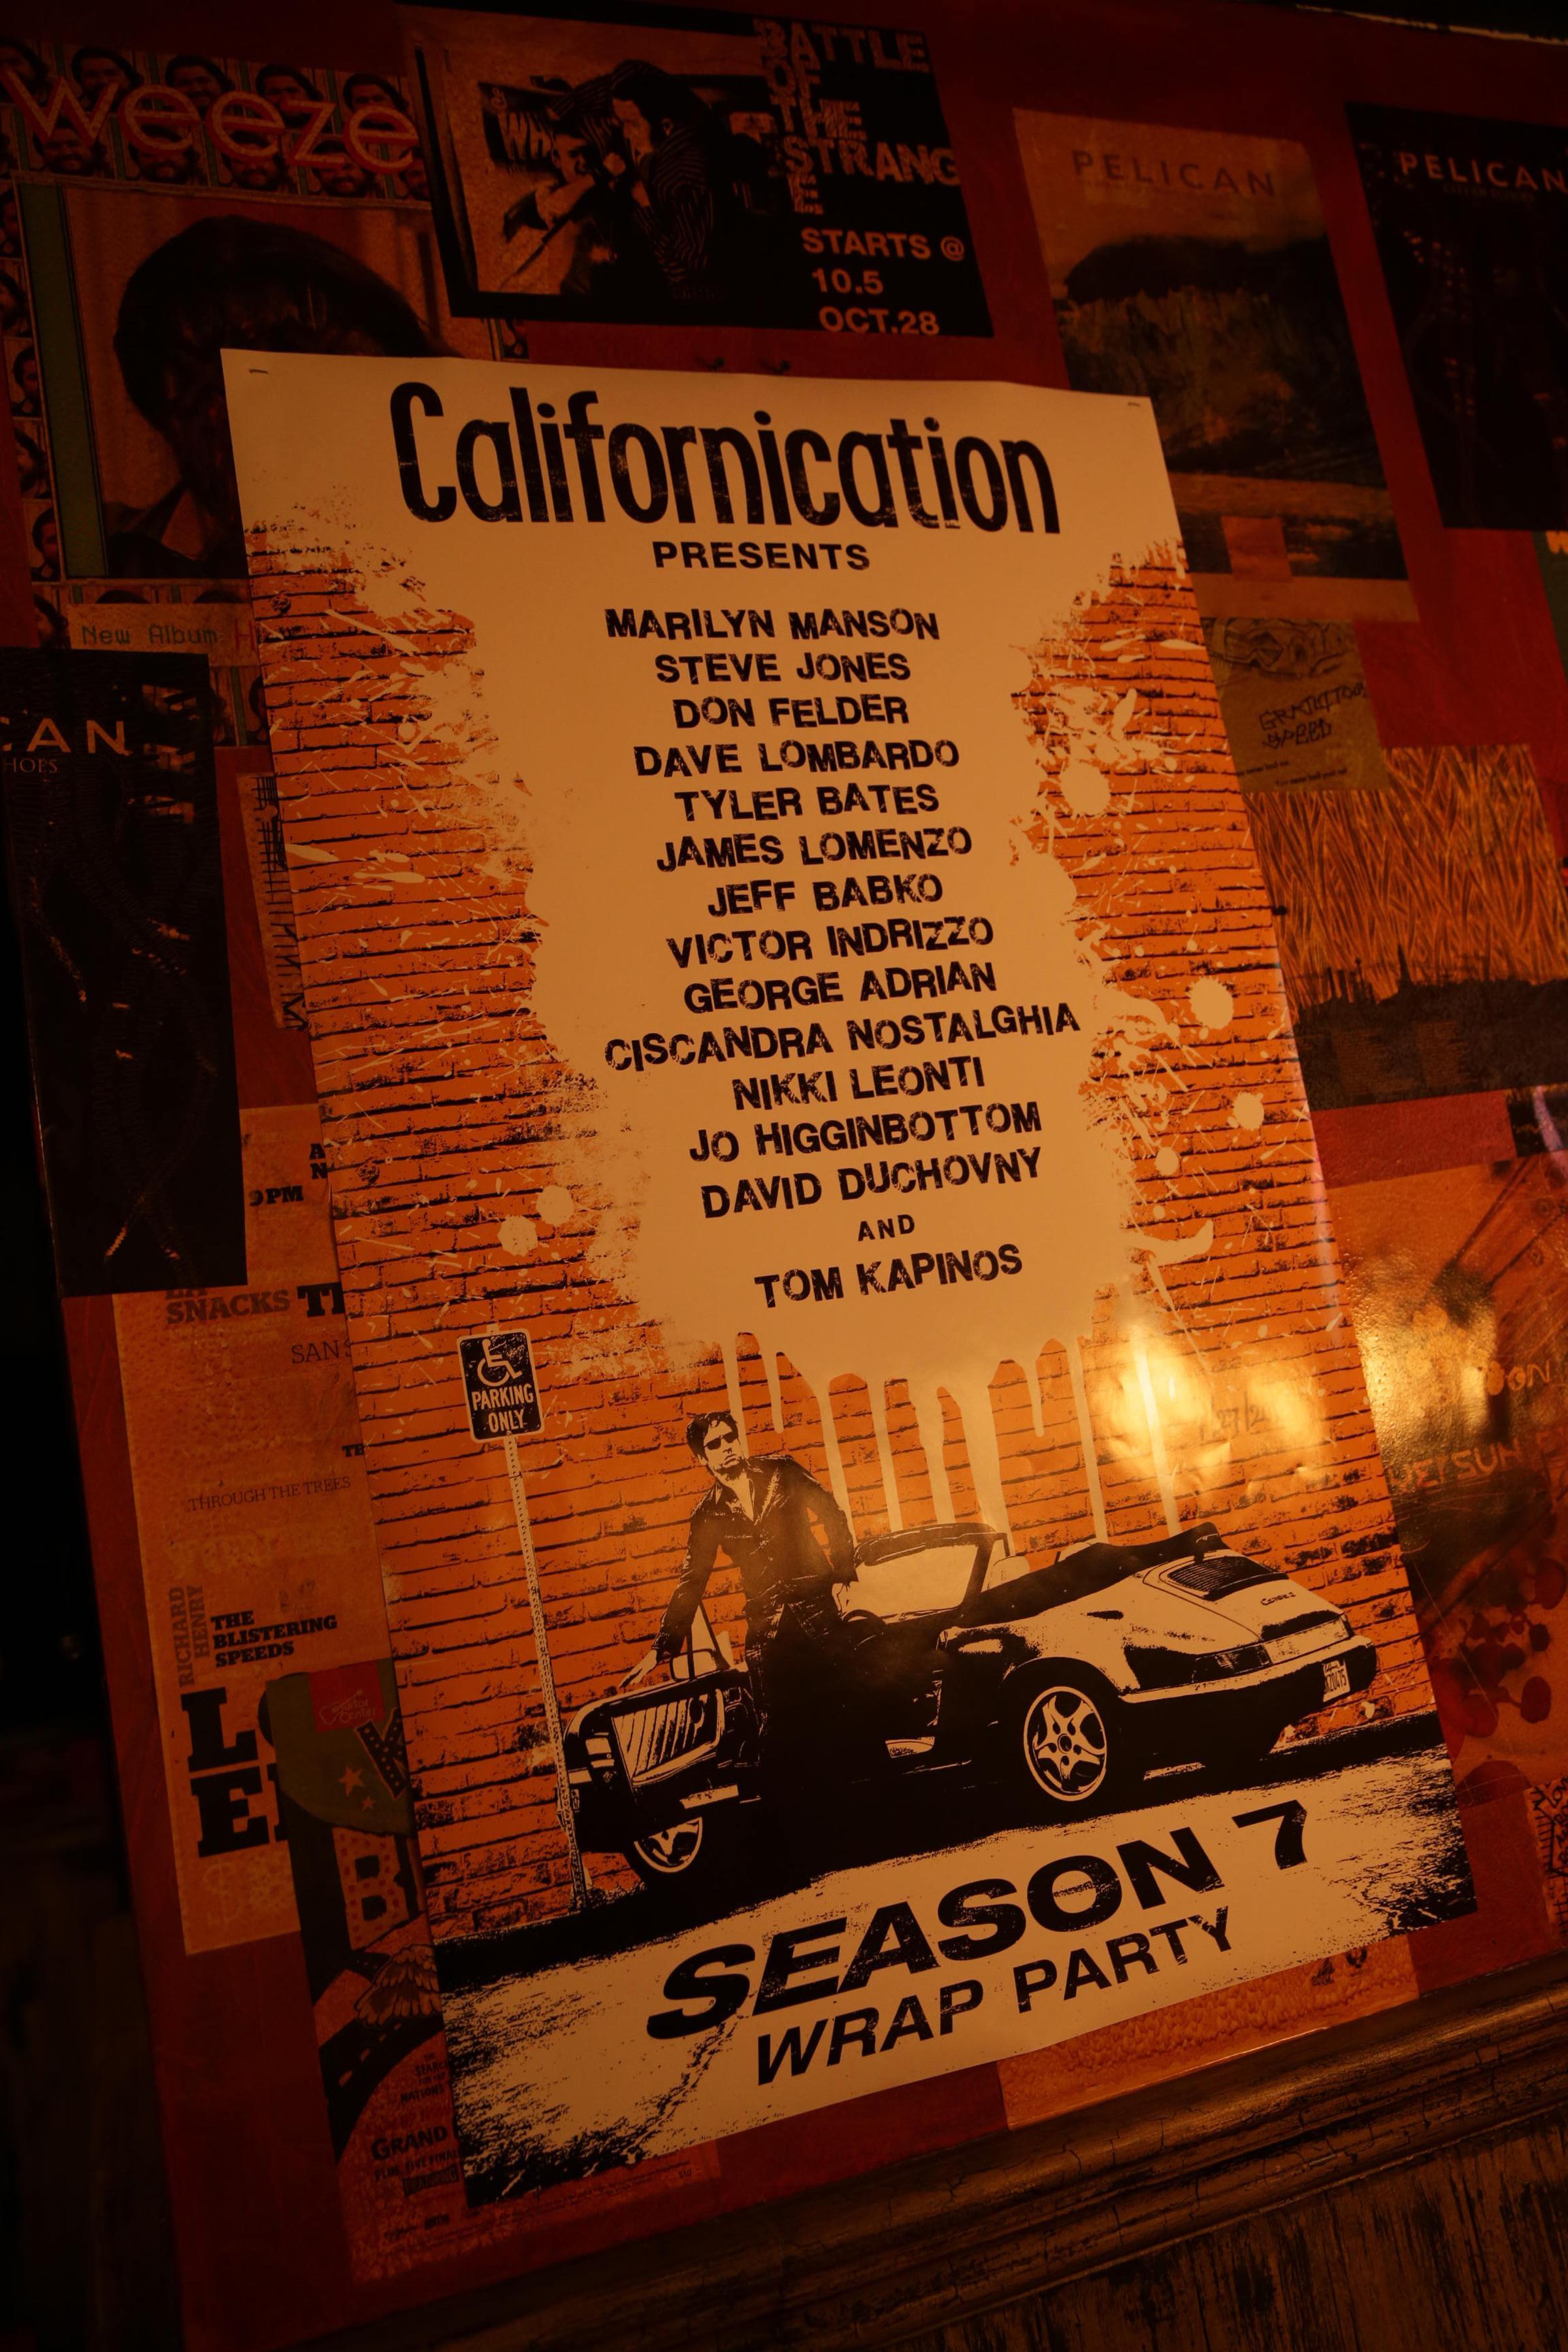 Californication - Season 7 - Wrap Party Photos (5)_FULL.jpg